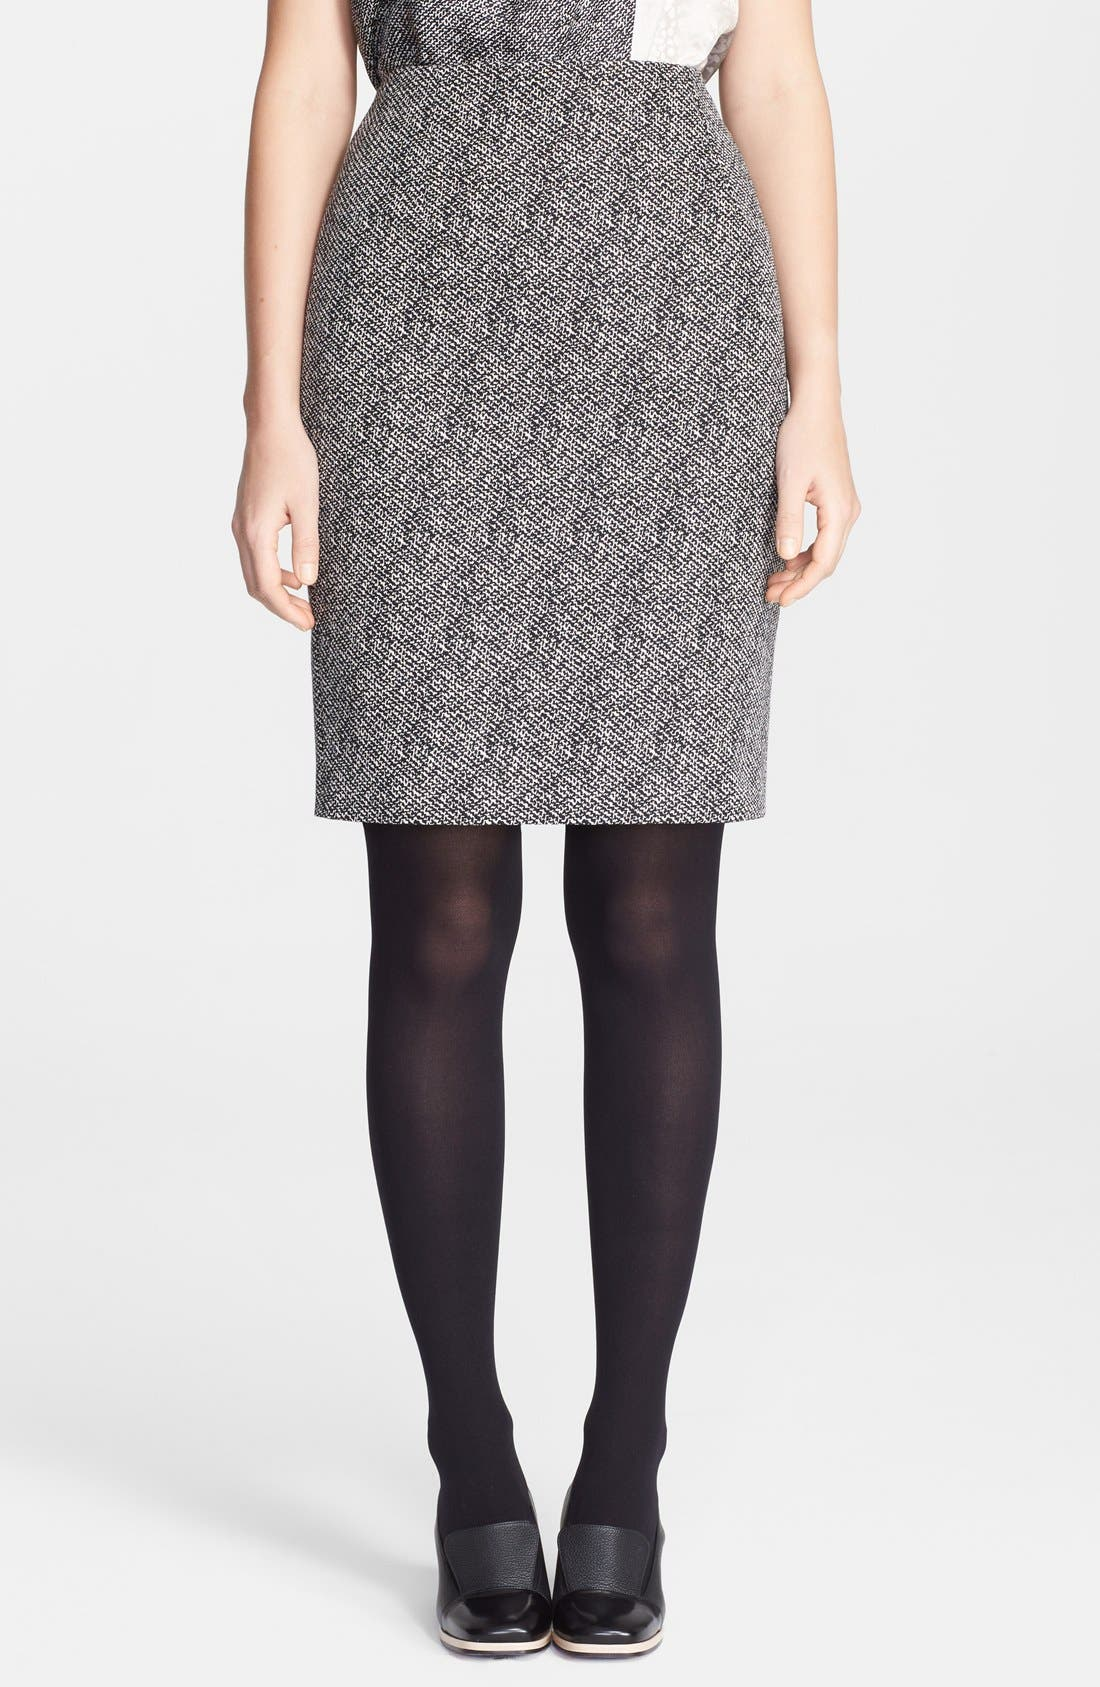 Main Image - Max Mara 'Eros' Pencil Skirt